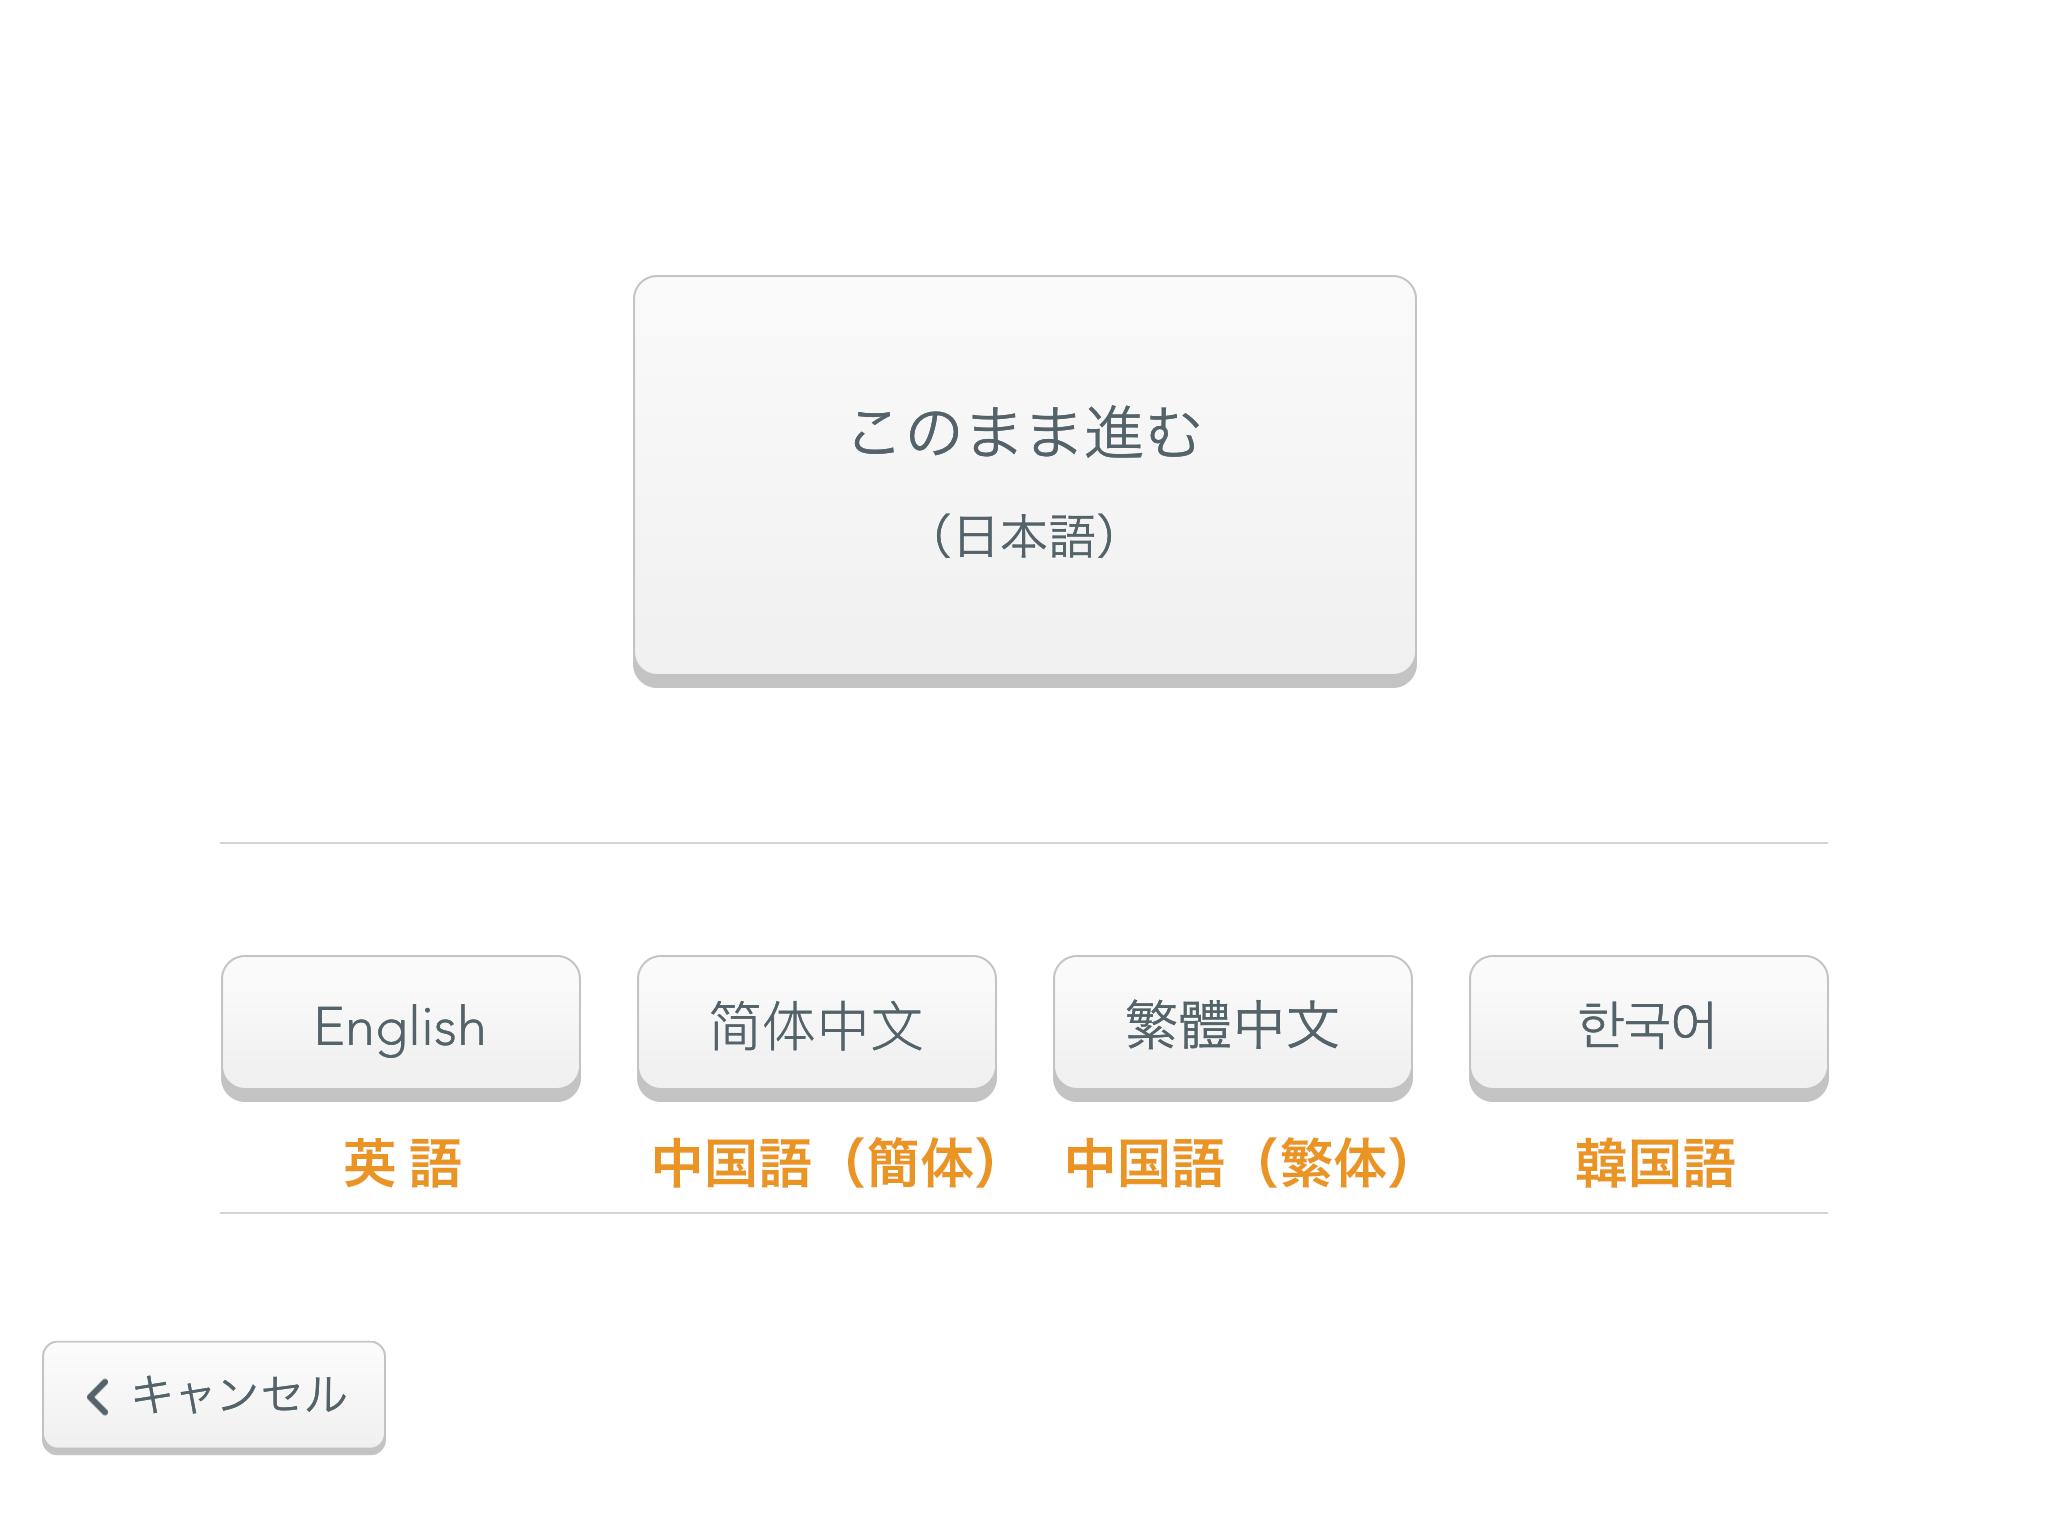 Airウェイト お客様モード 言語選択画面